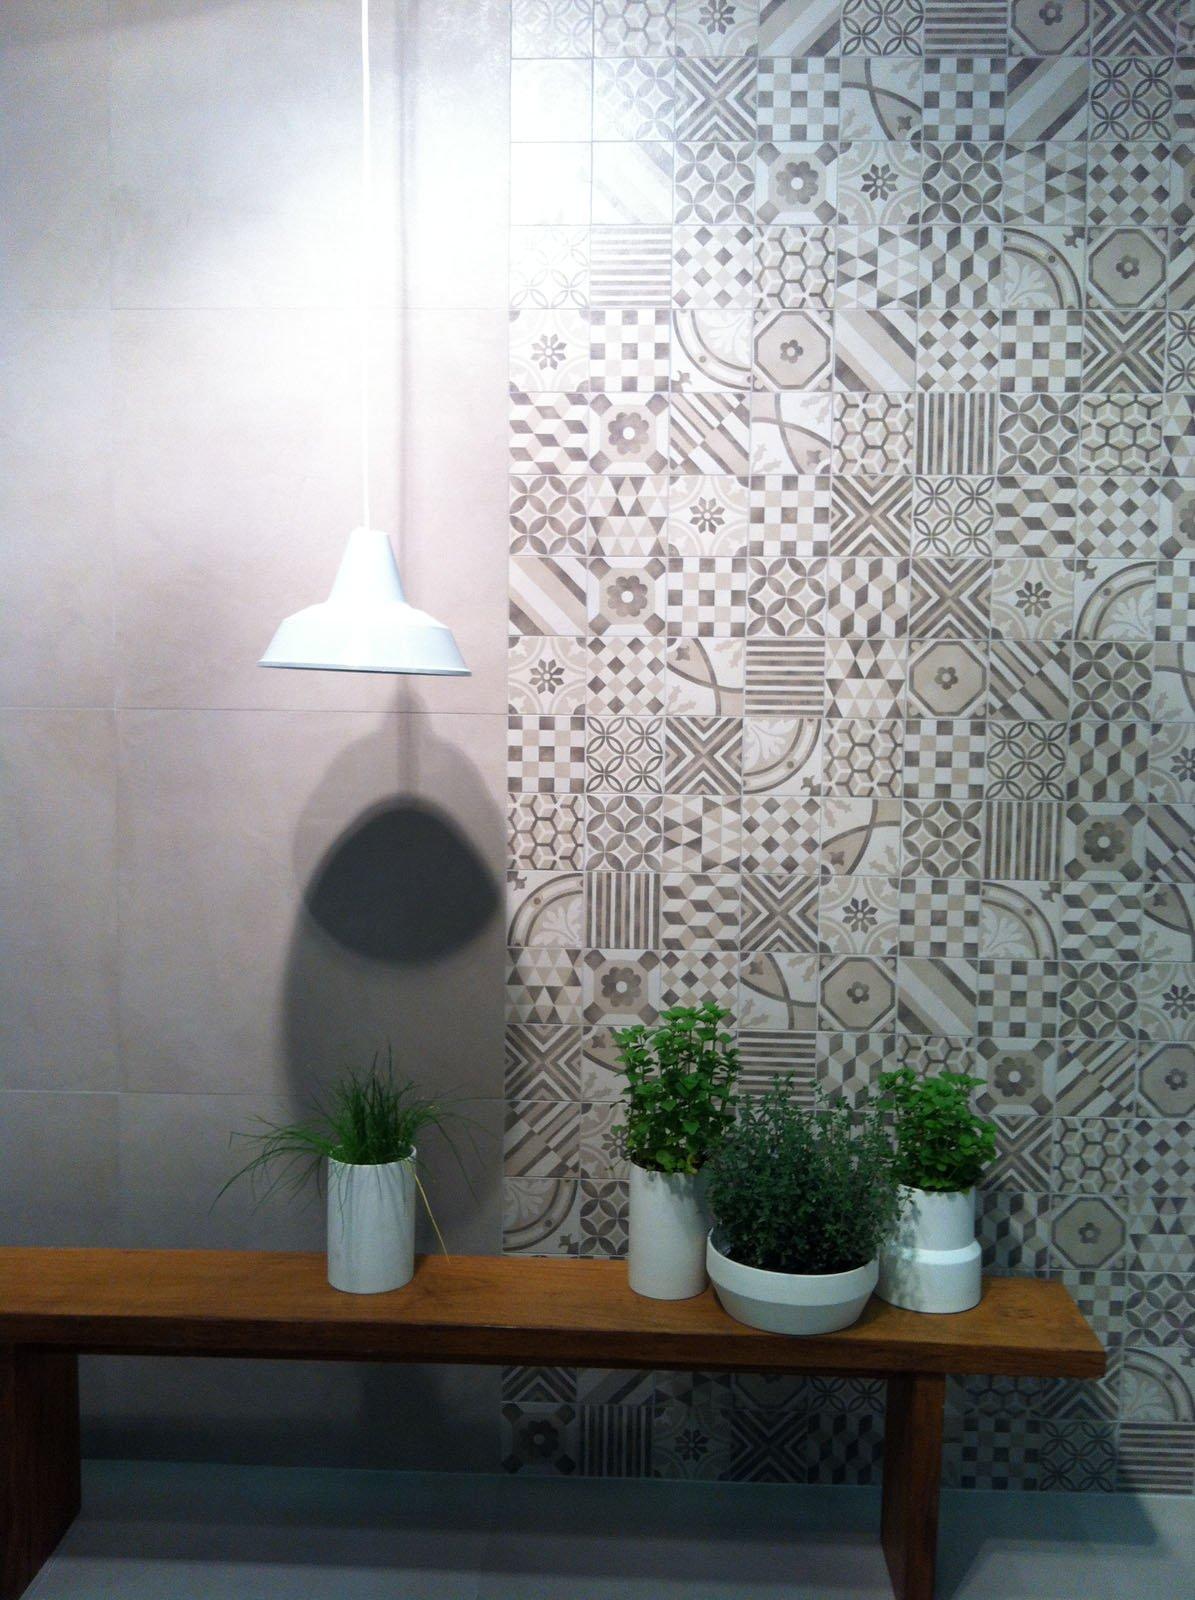 Cersaie 2013 proposte dal salone della ceramica cose di - Rivestimenti cucina marazzi ...